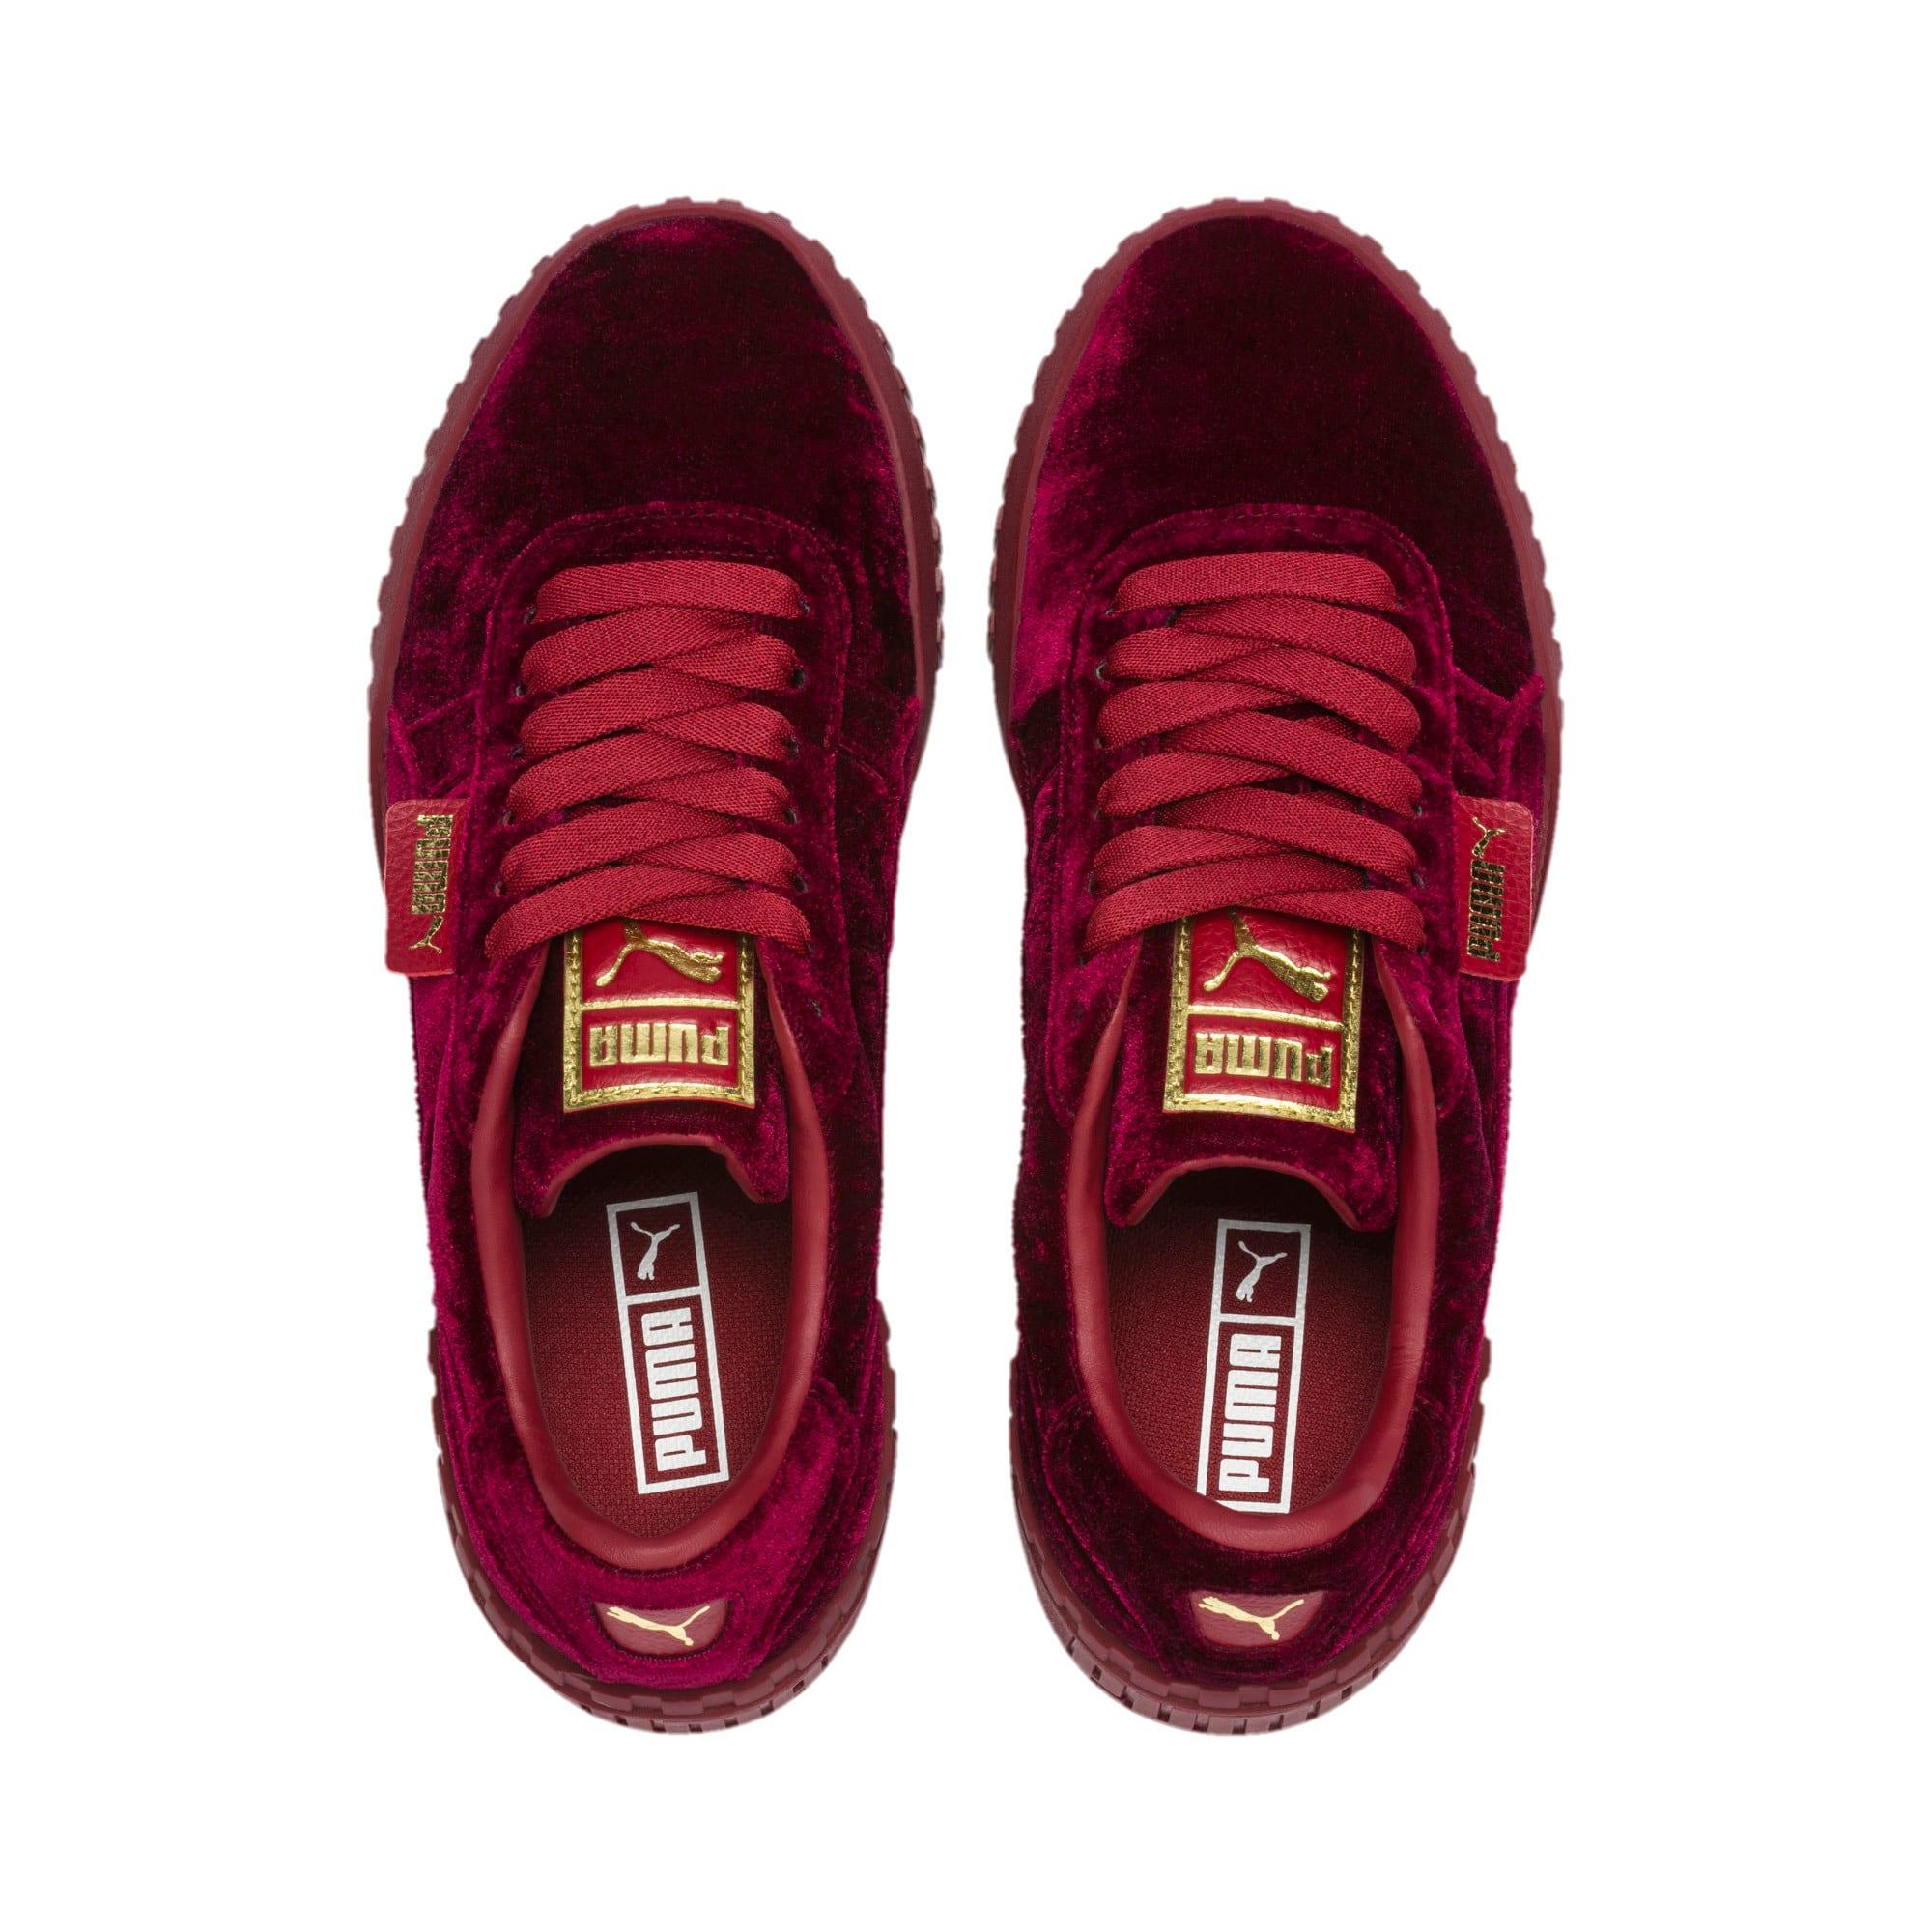 Miniatura 6 de Zapatos deportivosCali Velvetpara mujer, Tibetan Red-Tibetan Red, mediano